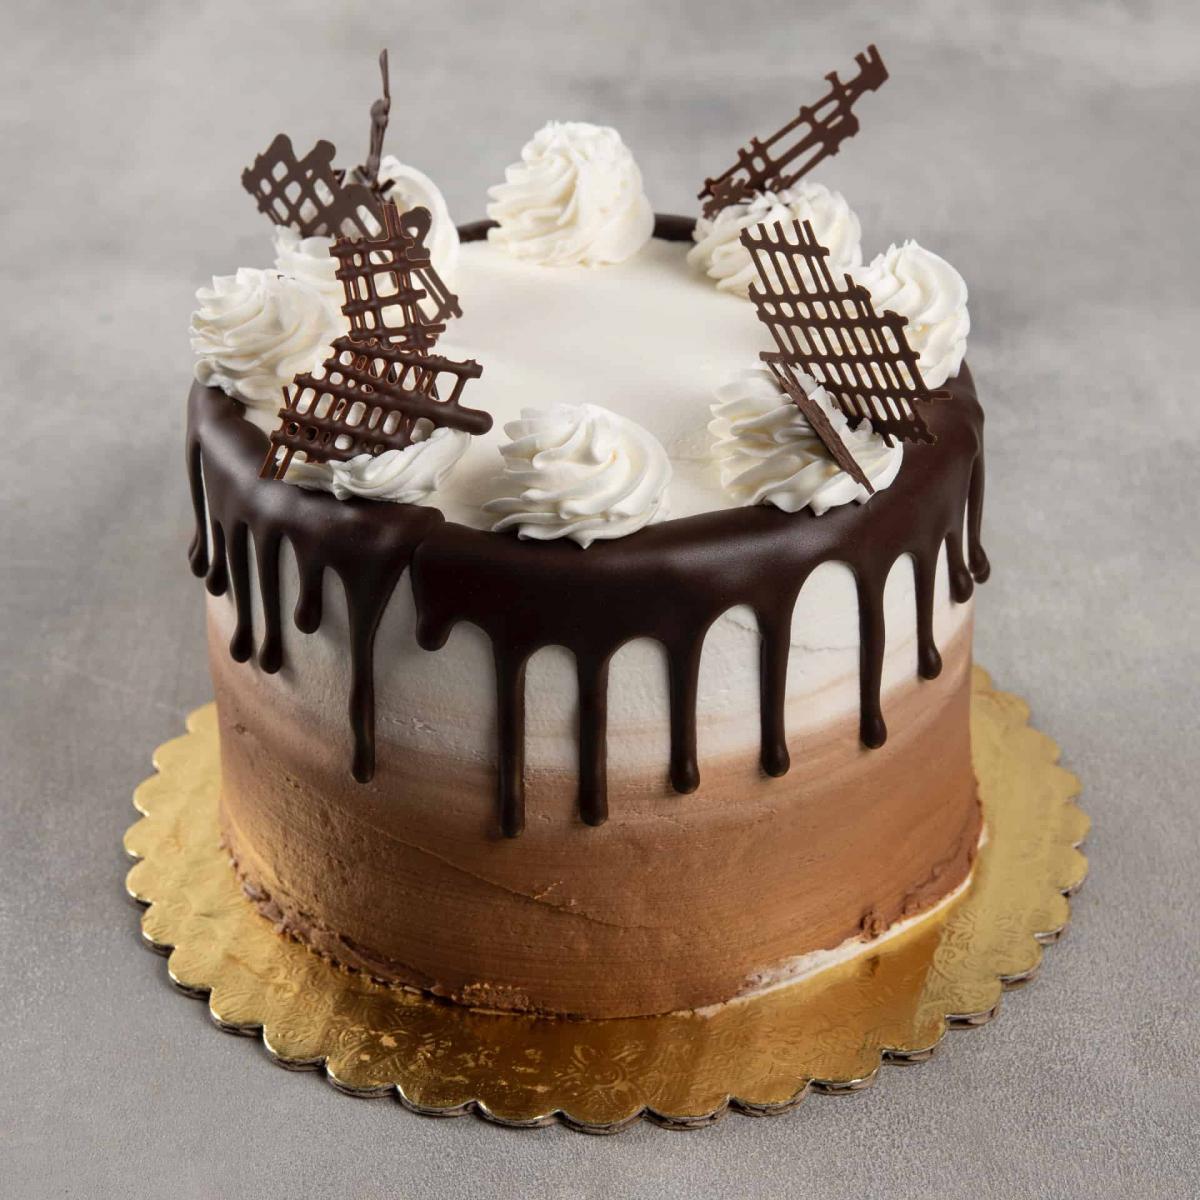 Chocolate Flair